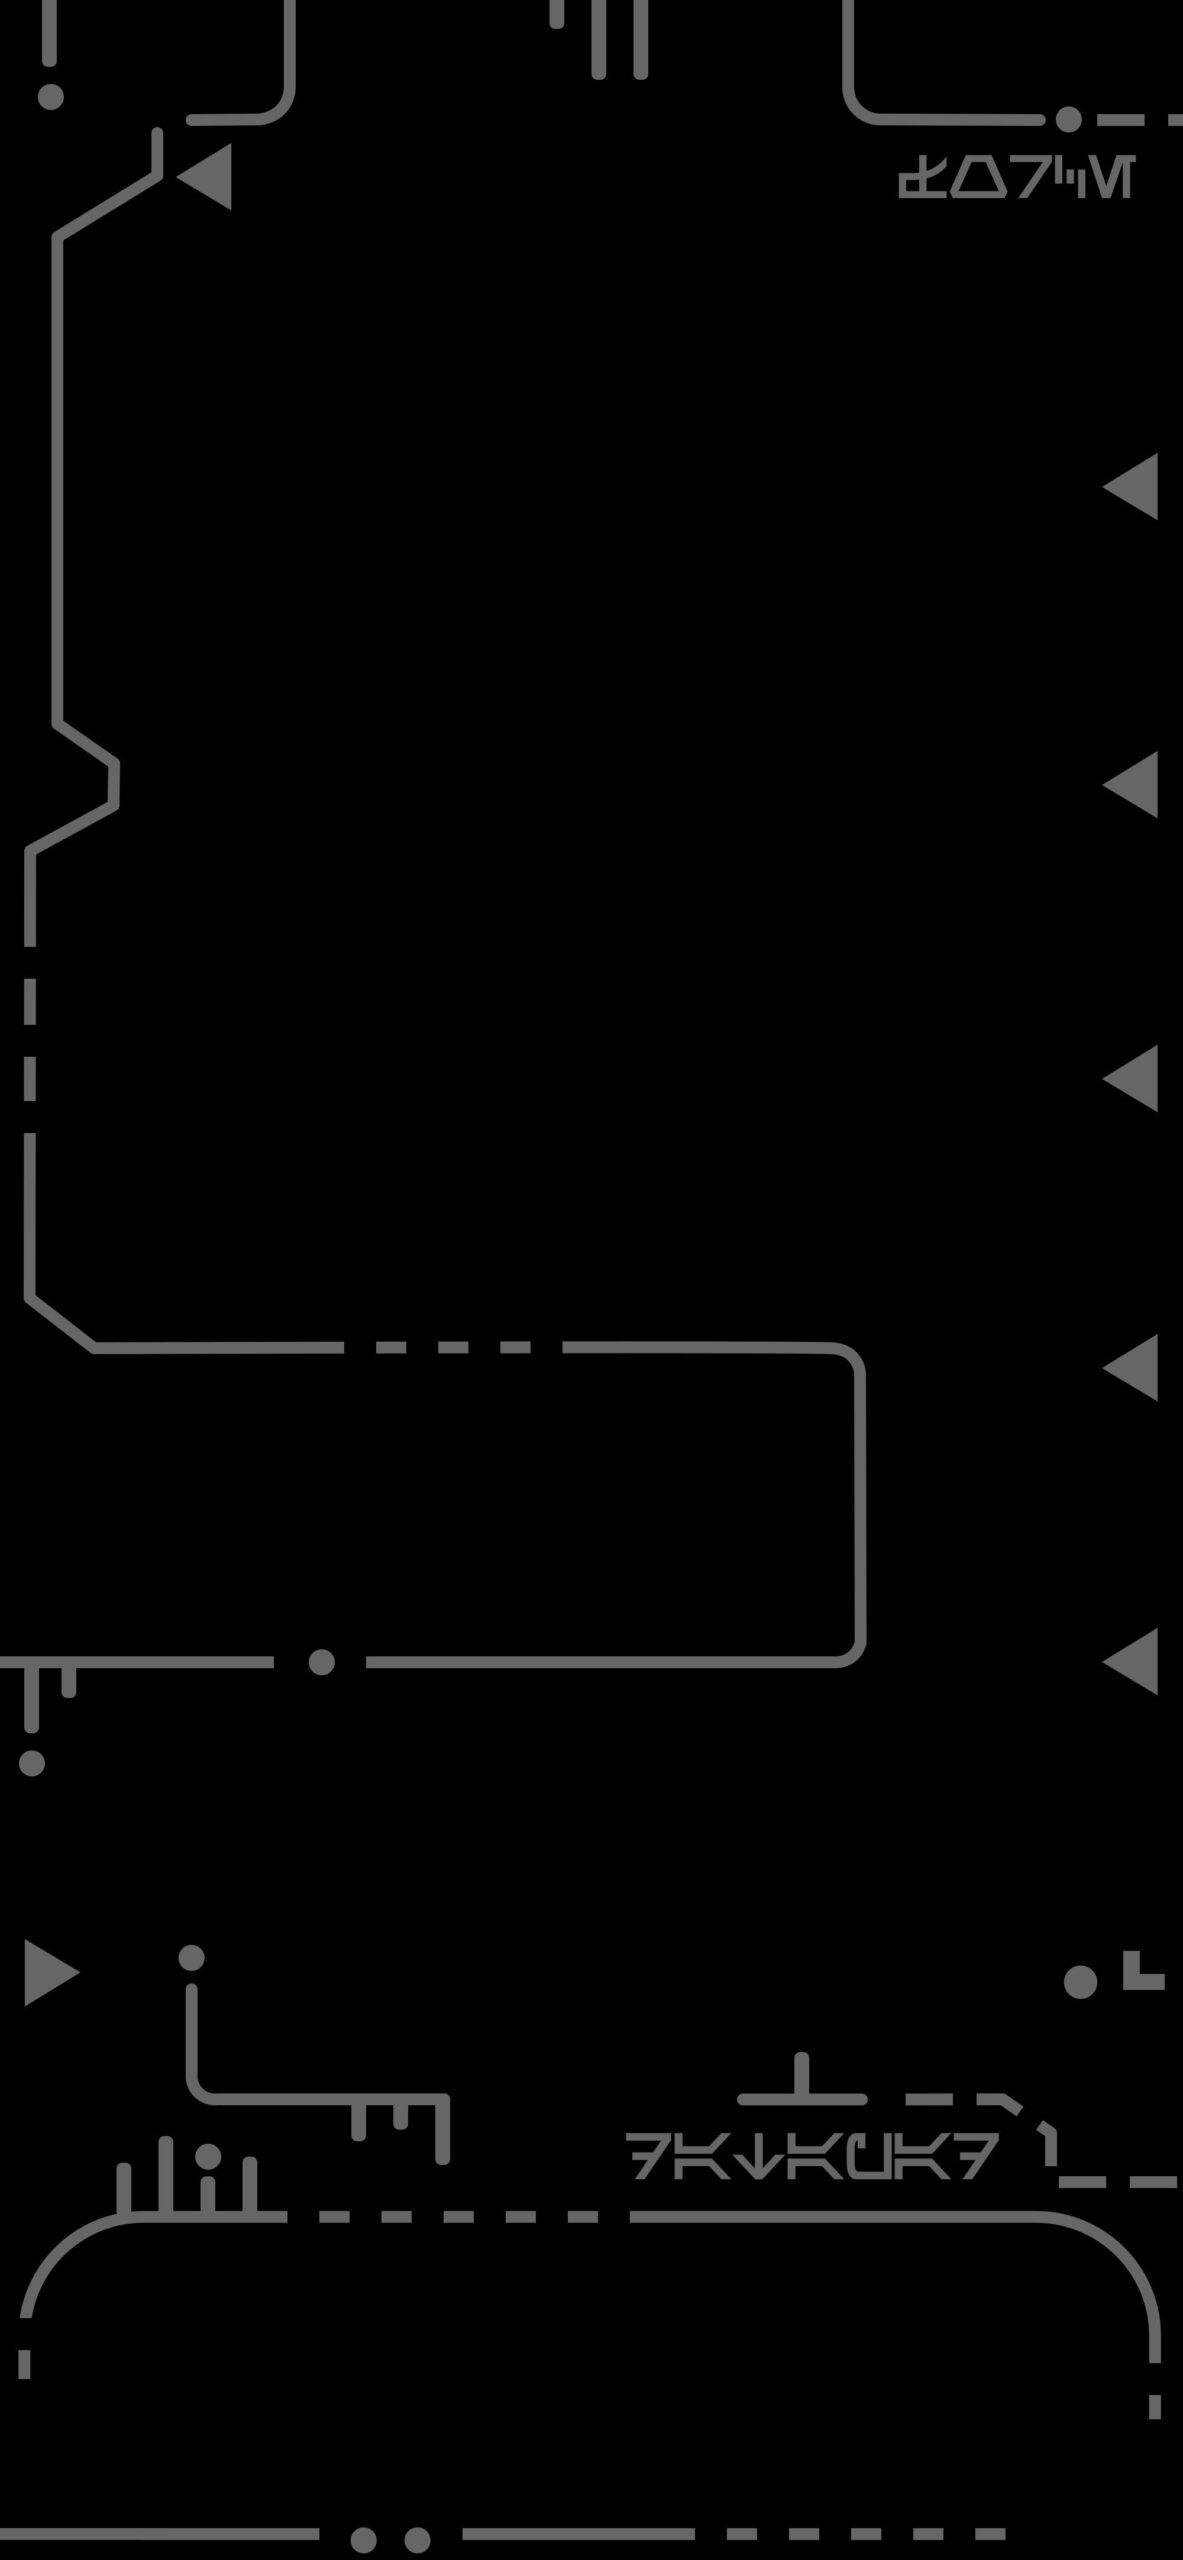 star wars datapad black background